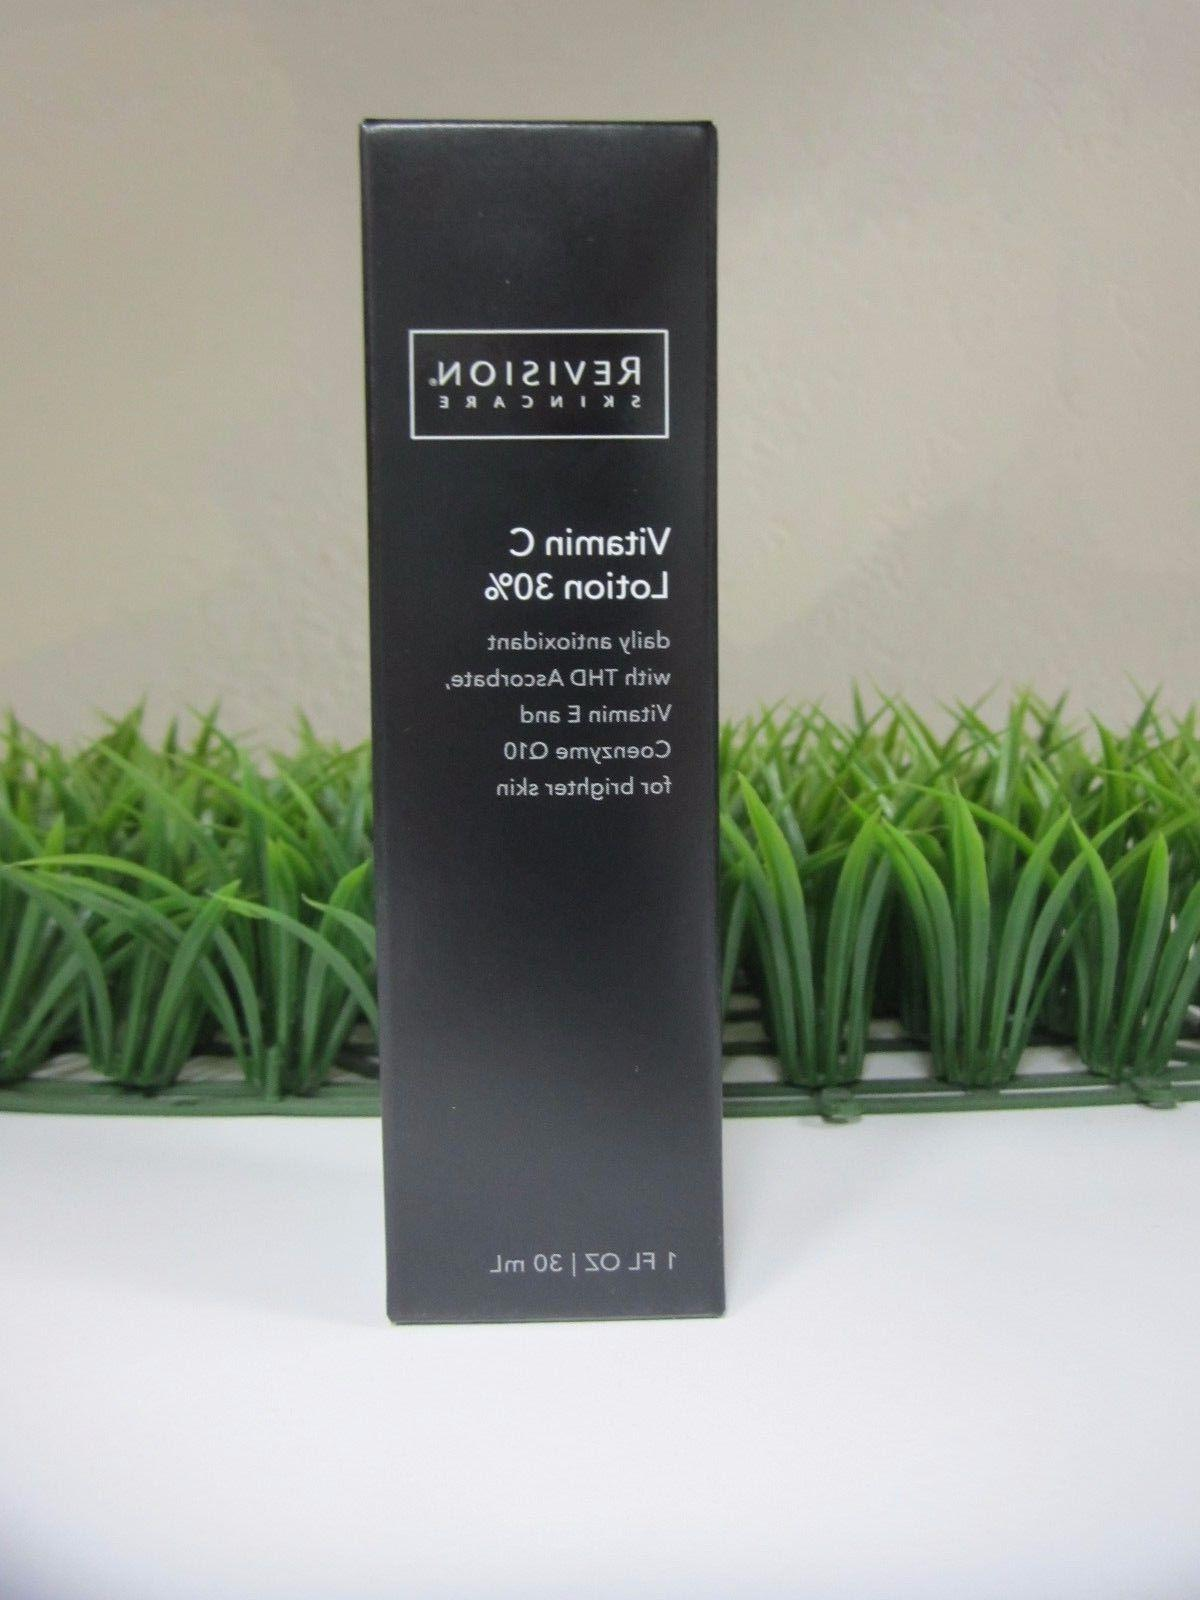 Revision Skincare Vitamin C Lotion 30%, 1 fl oz, FREE SHIPPI